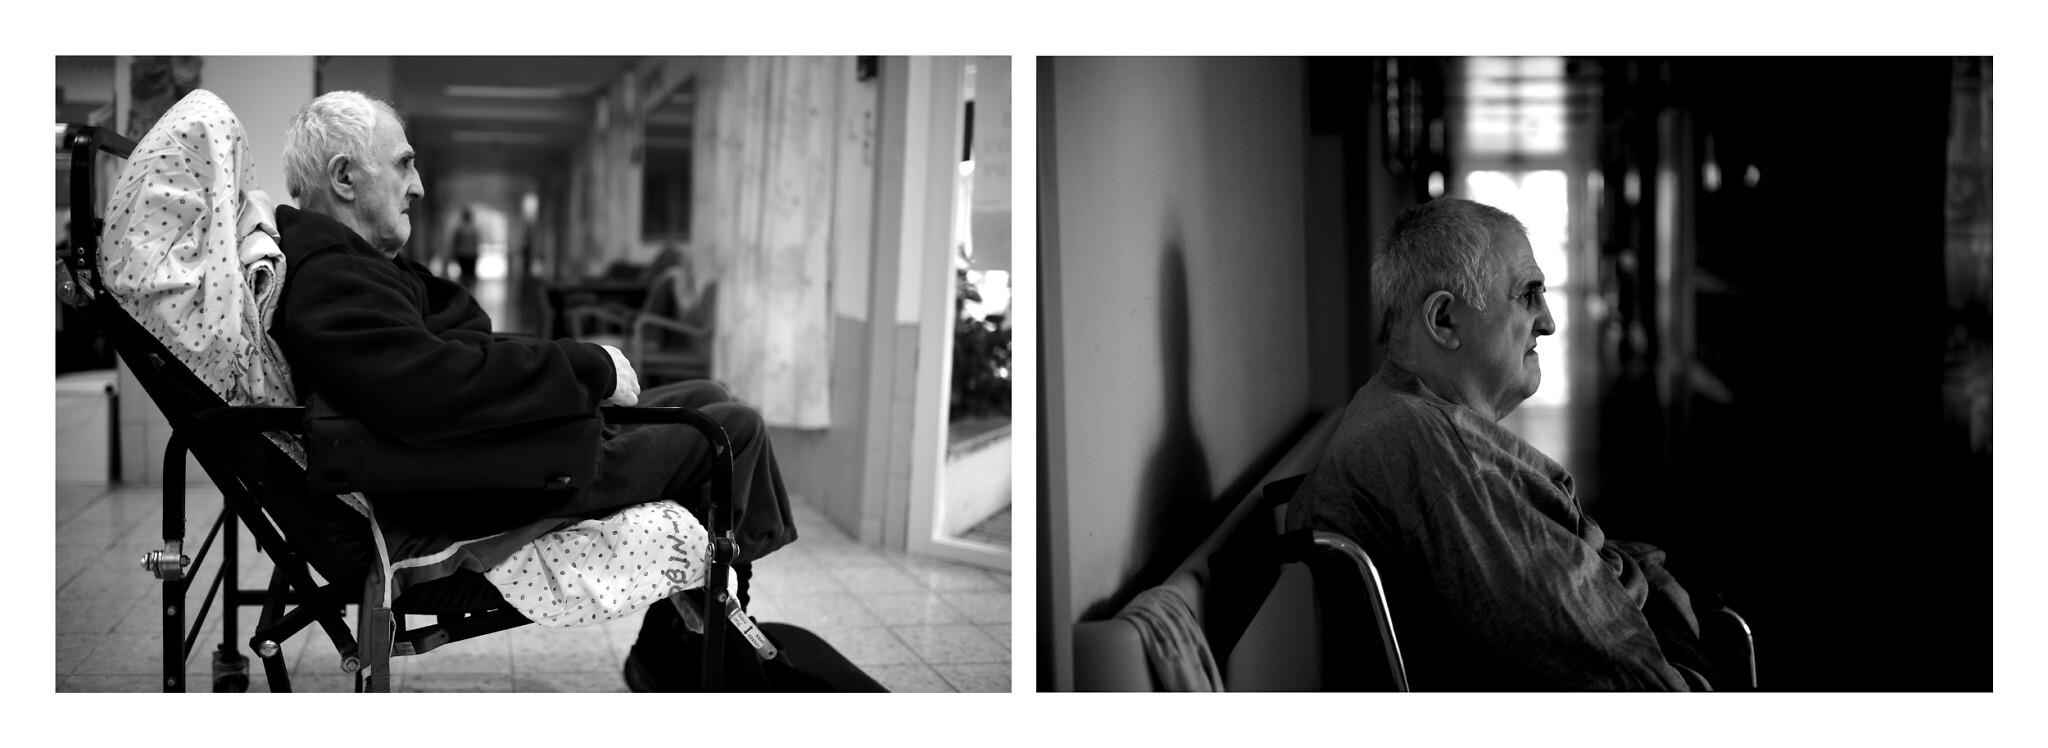 Left, 2020: Efraim Kruzel, 80, sits in his fixed spot. Right, 2010: Efraim Kruzel, 70 at that time, at the hostel (Courtesy Gili Yaari)